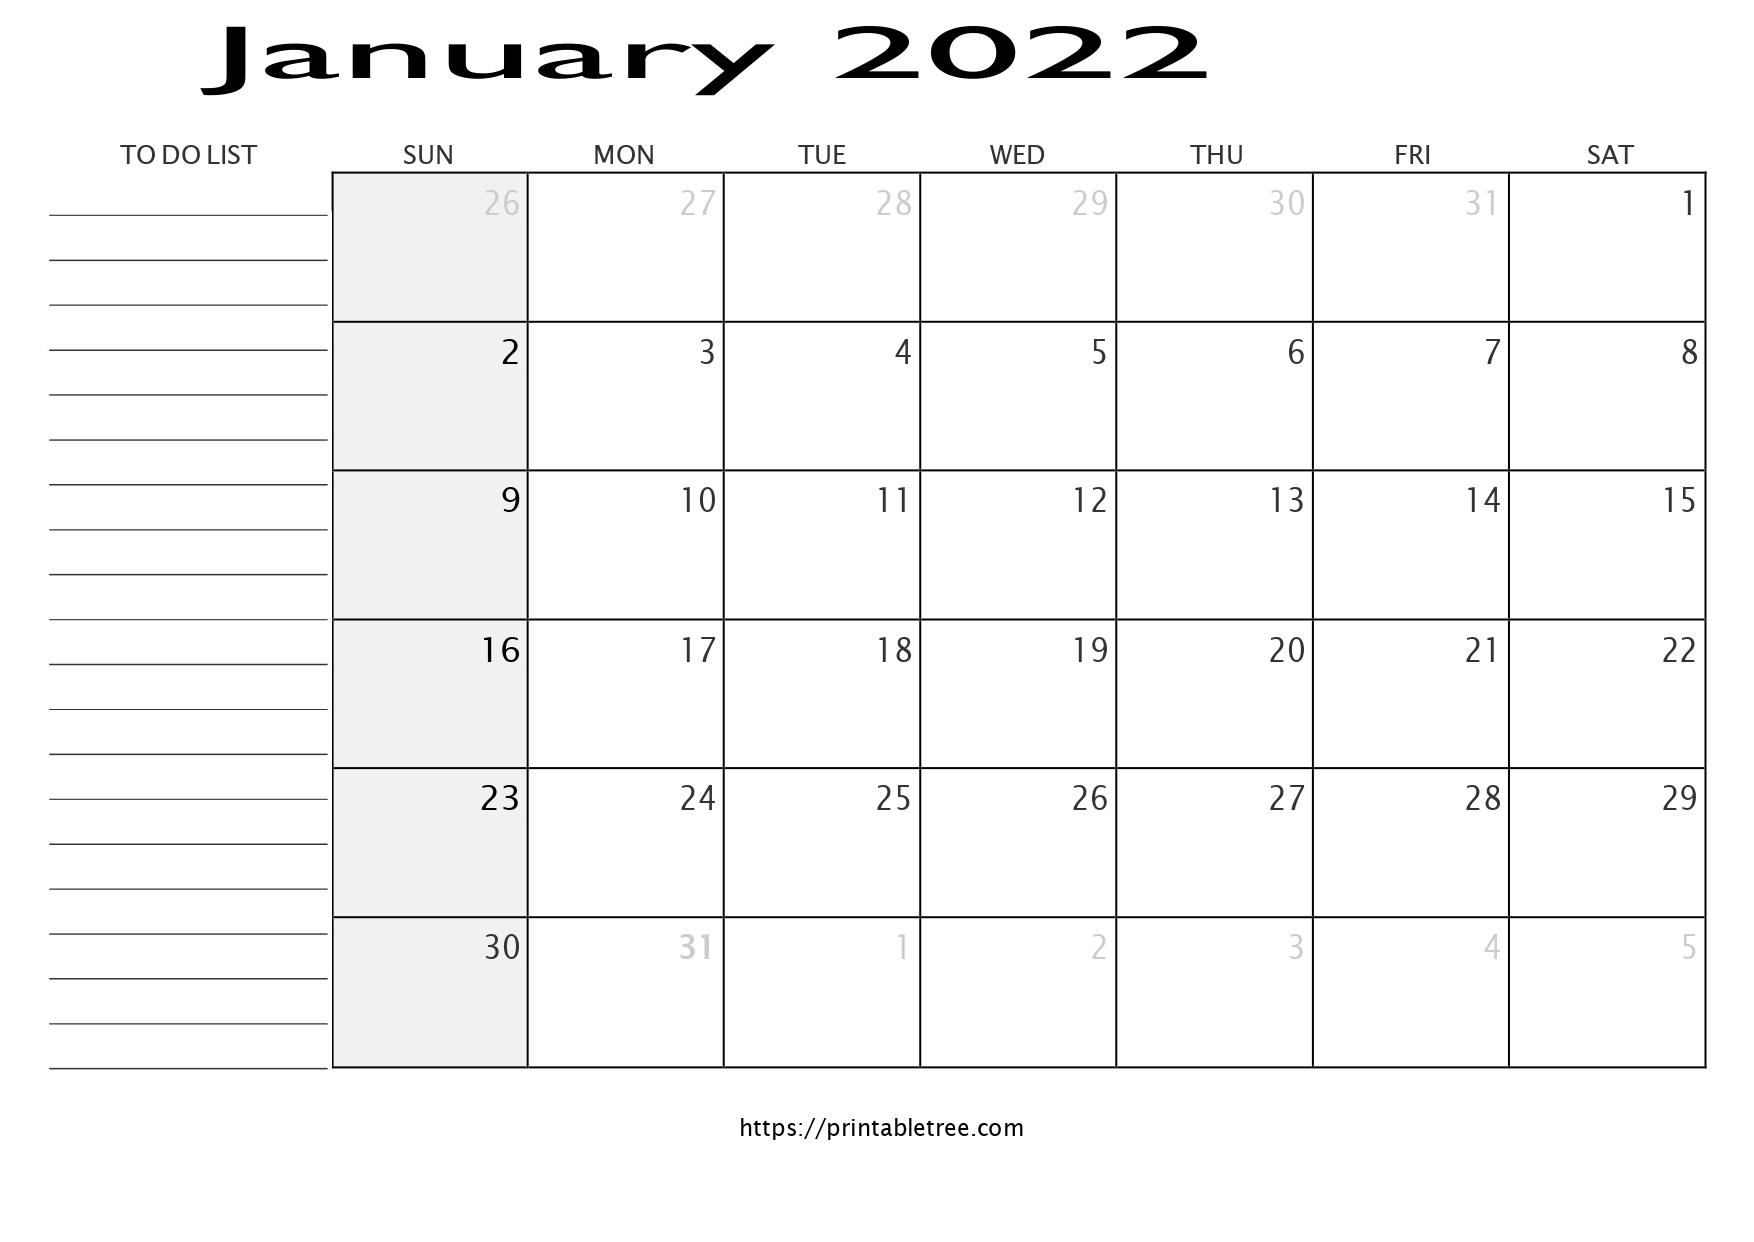 Calendar with To Do List January 2022